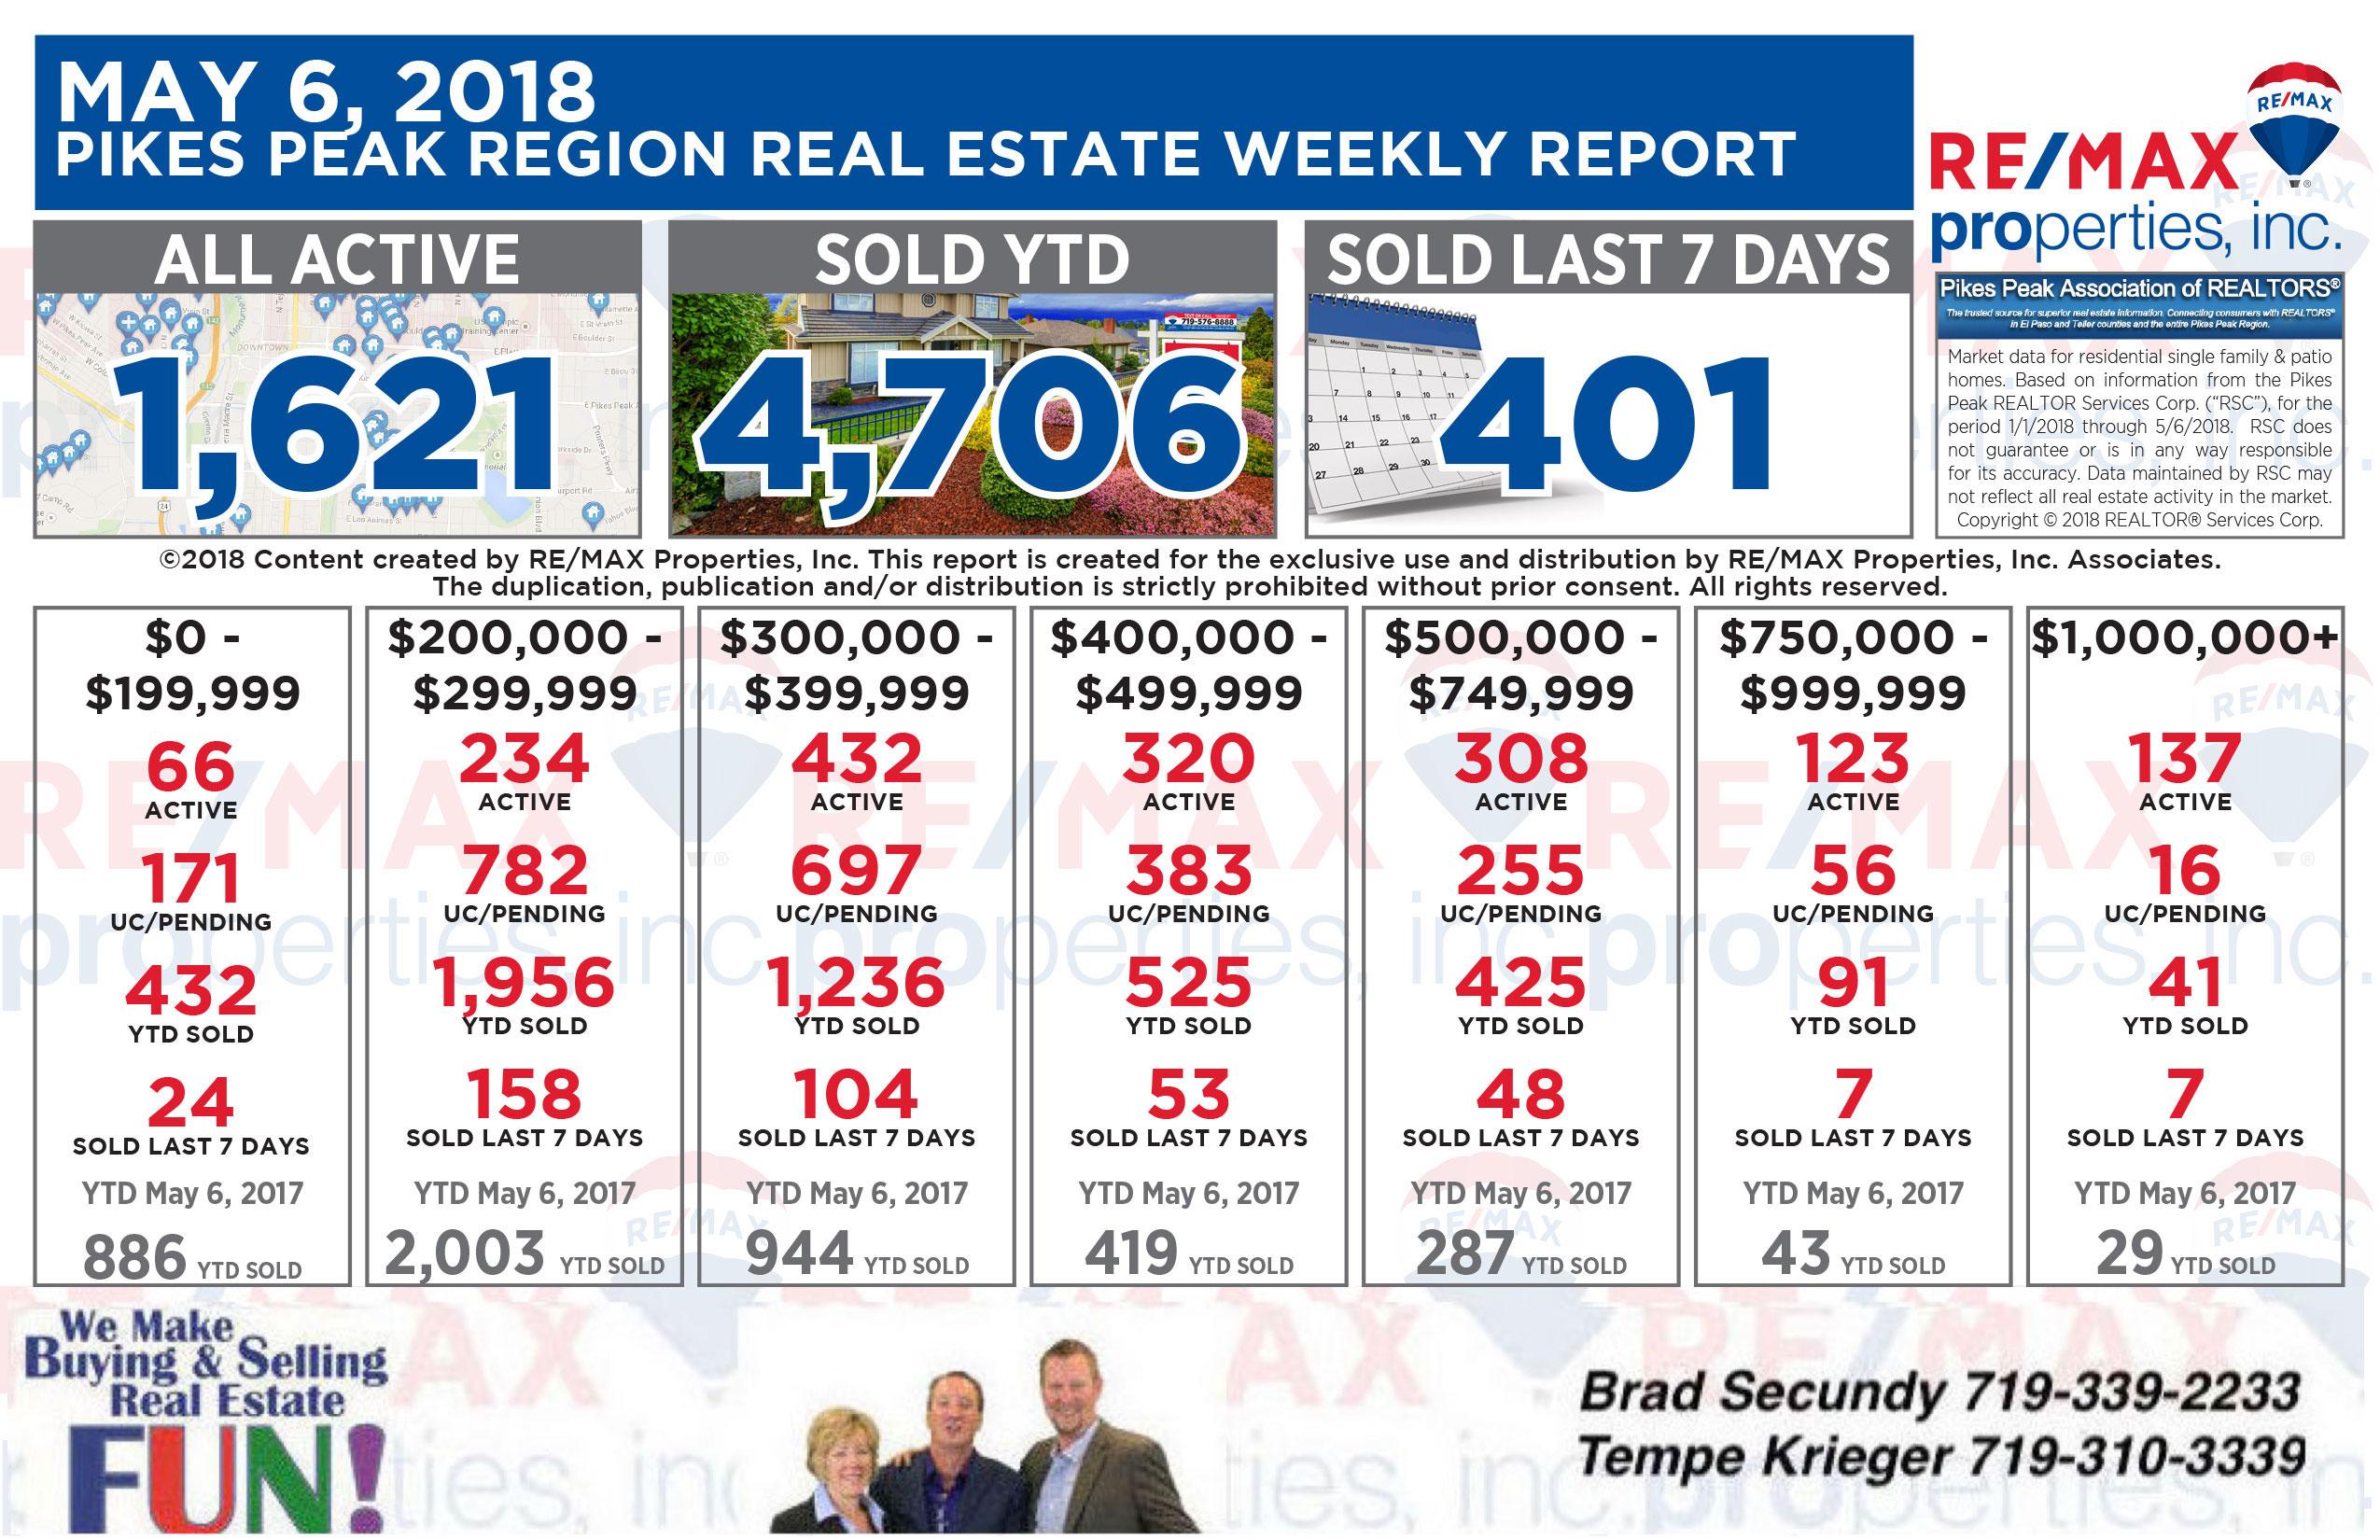 Colorado Springs Real Estate Statistics 5-6-2018